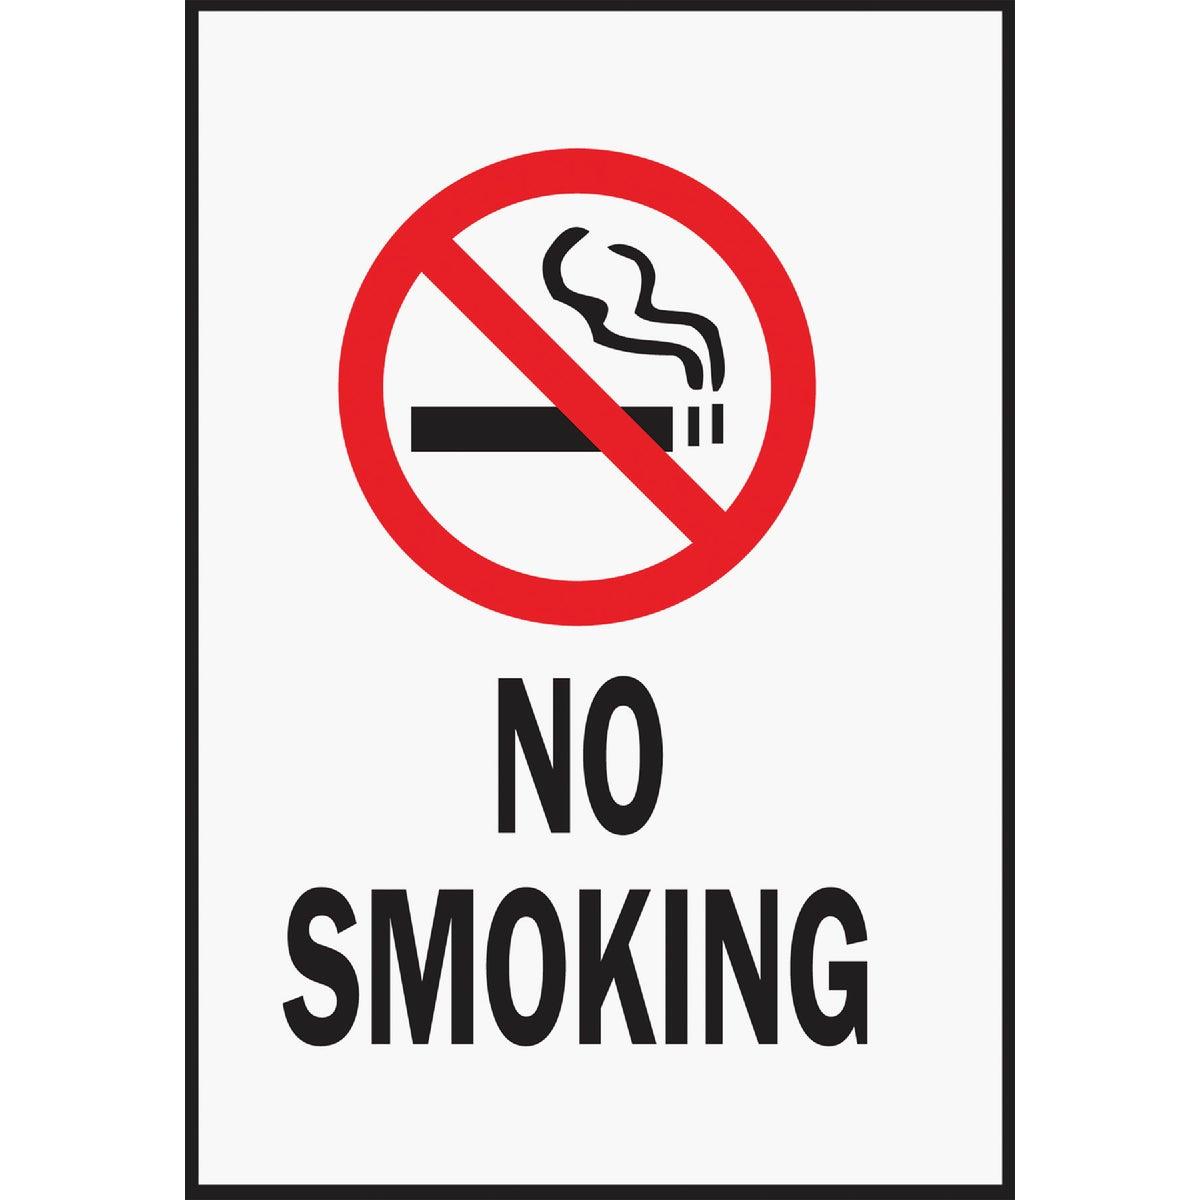 6-3/4X11 NO SMOKING SIGN - HSV-8 by Hy Ko Prods Co